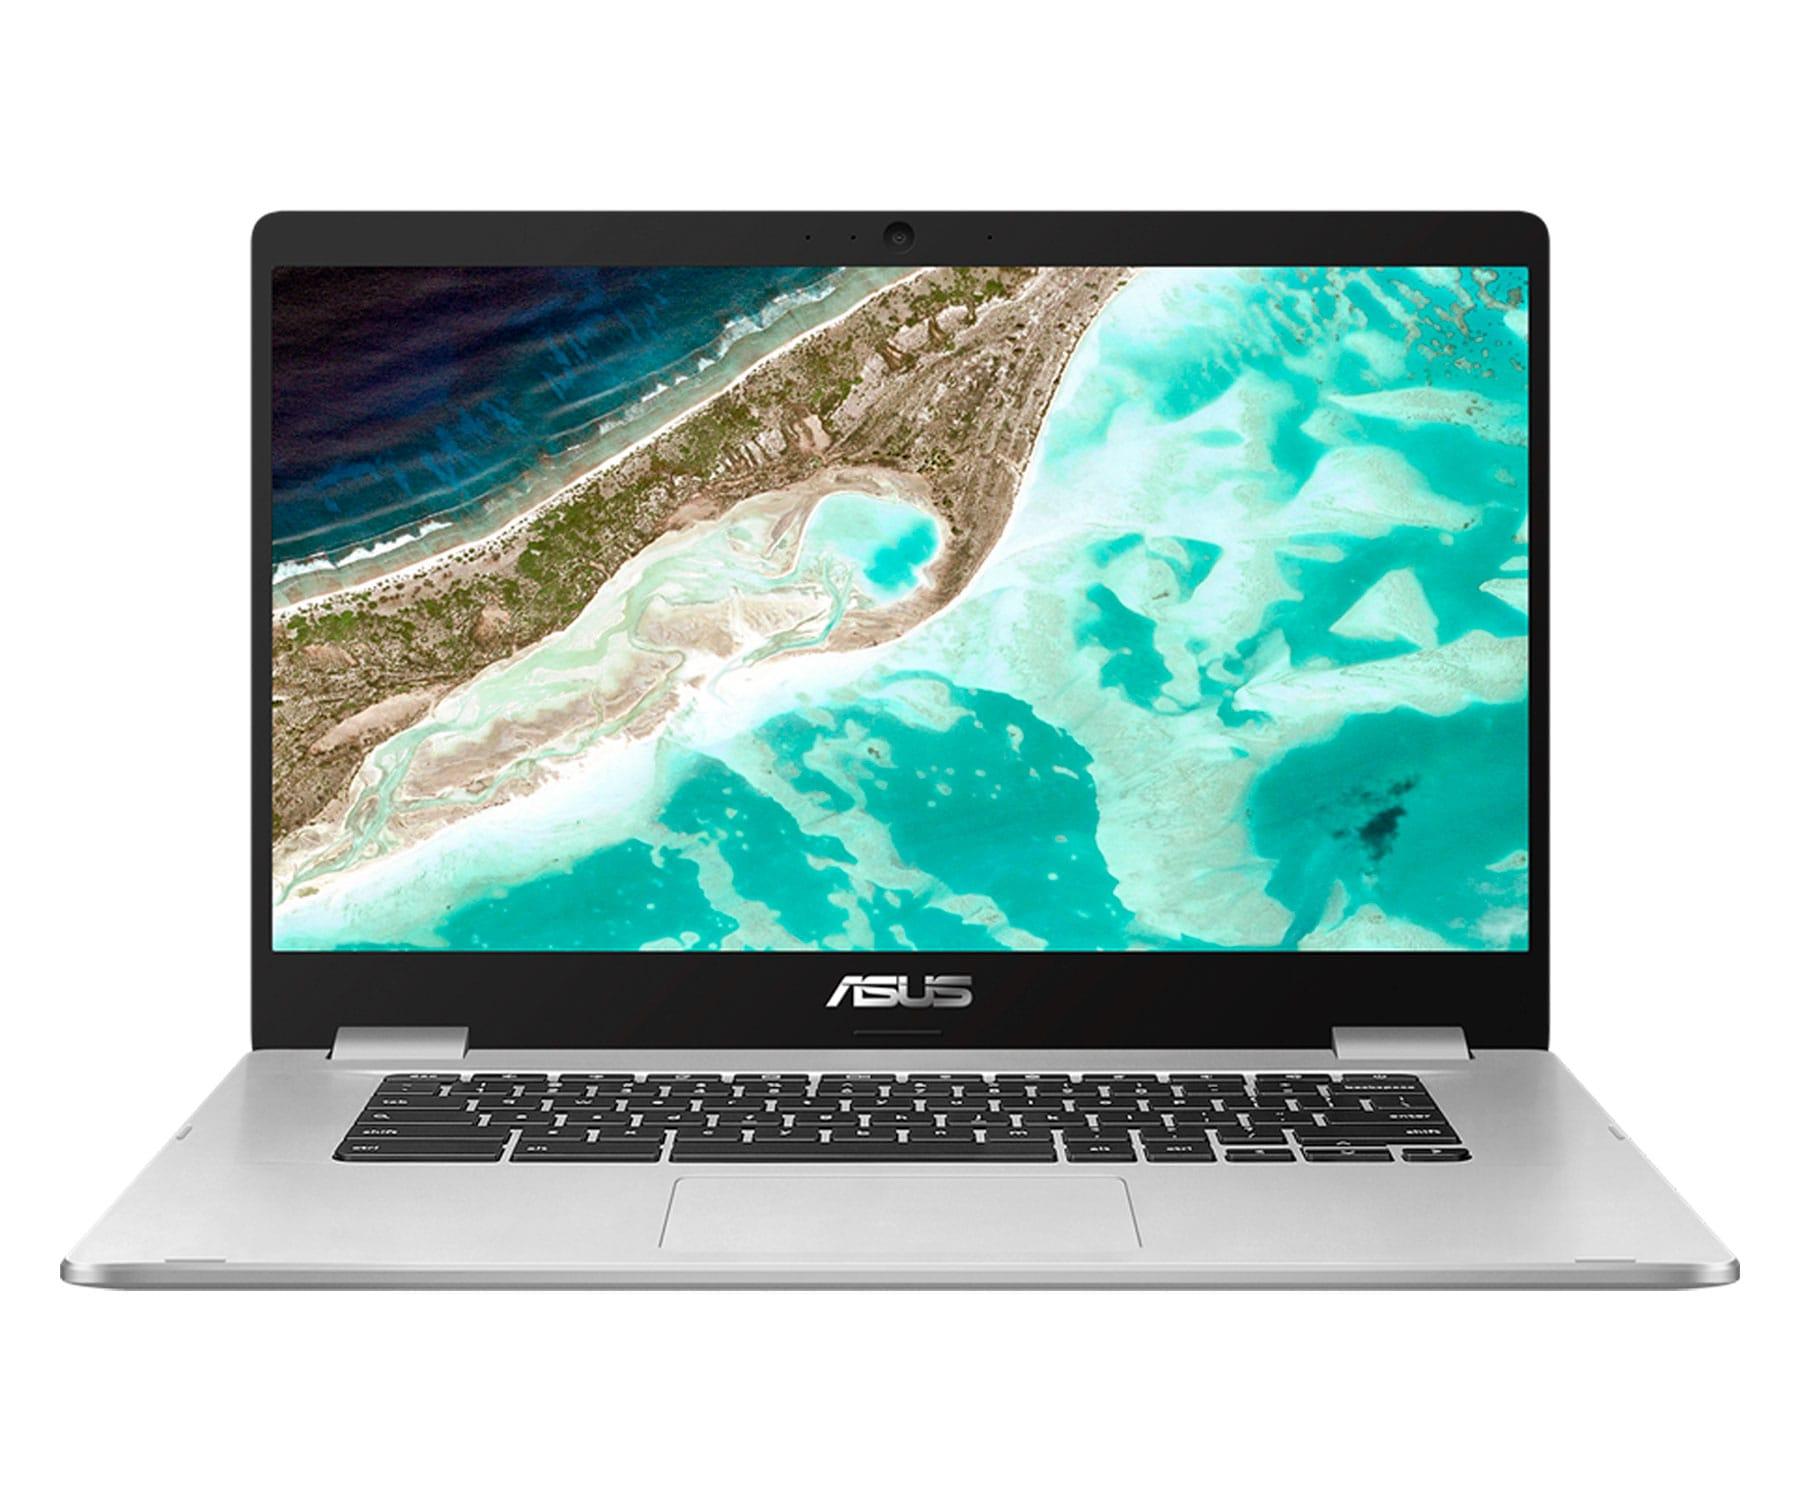 ASUS CHROMEBOOK Z1400CN INTEL CELERON, 8GB, 64GB